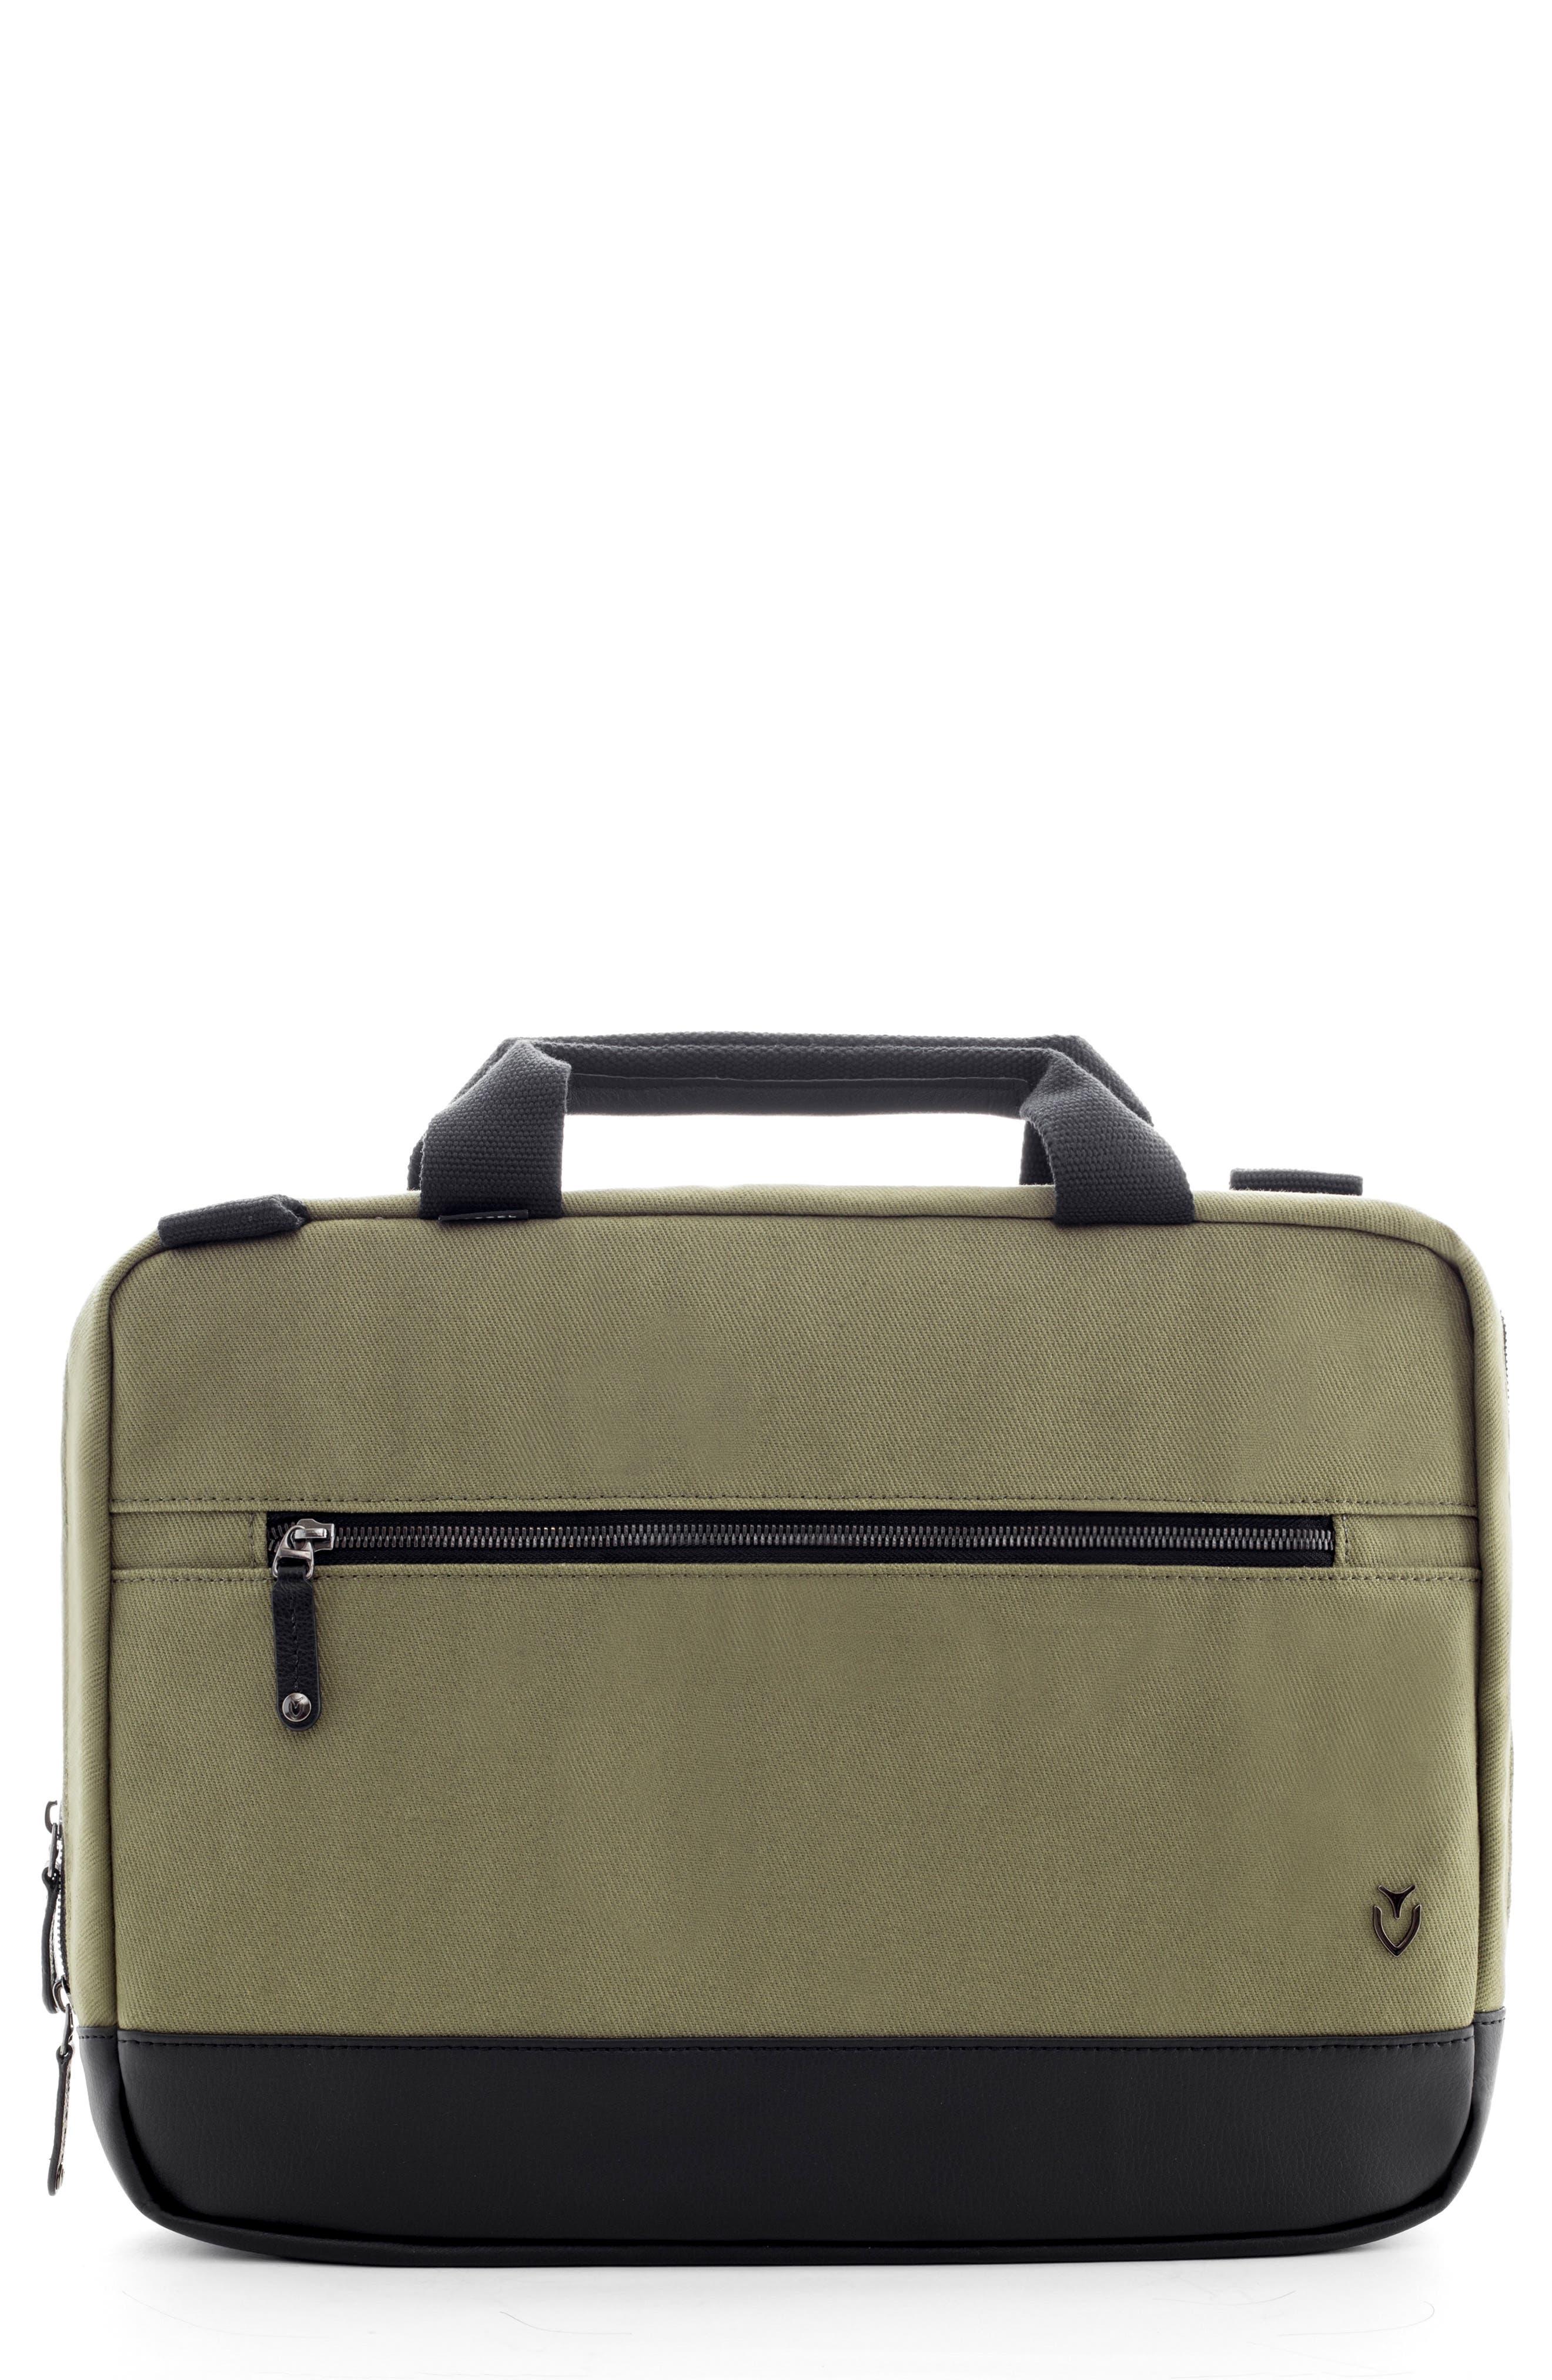 Vessel Refined Briefcase